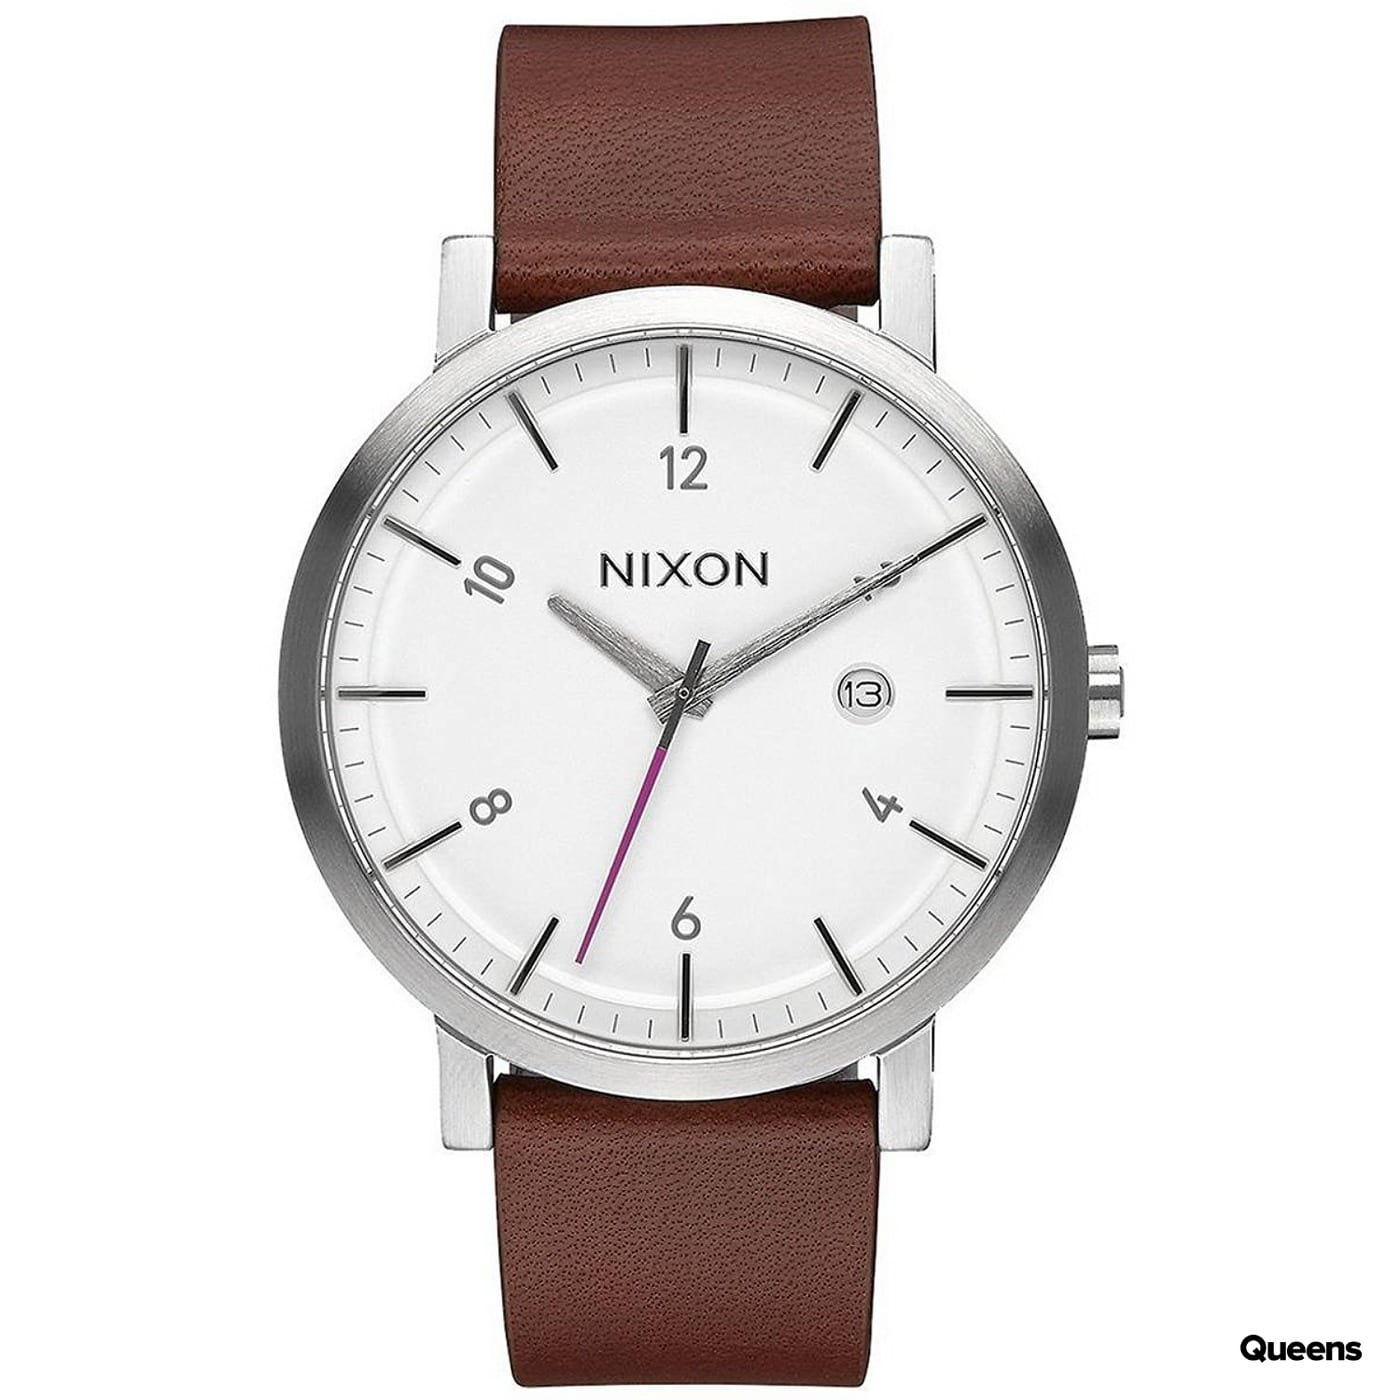 Nixon Rollo silber / braun / weiß